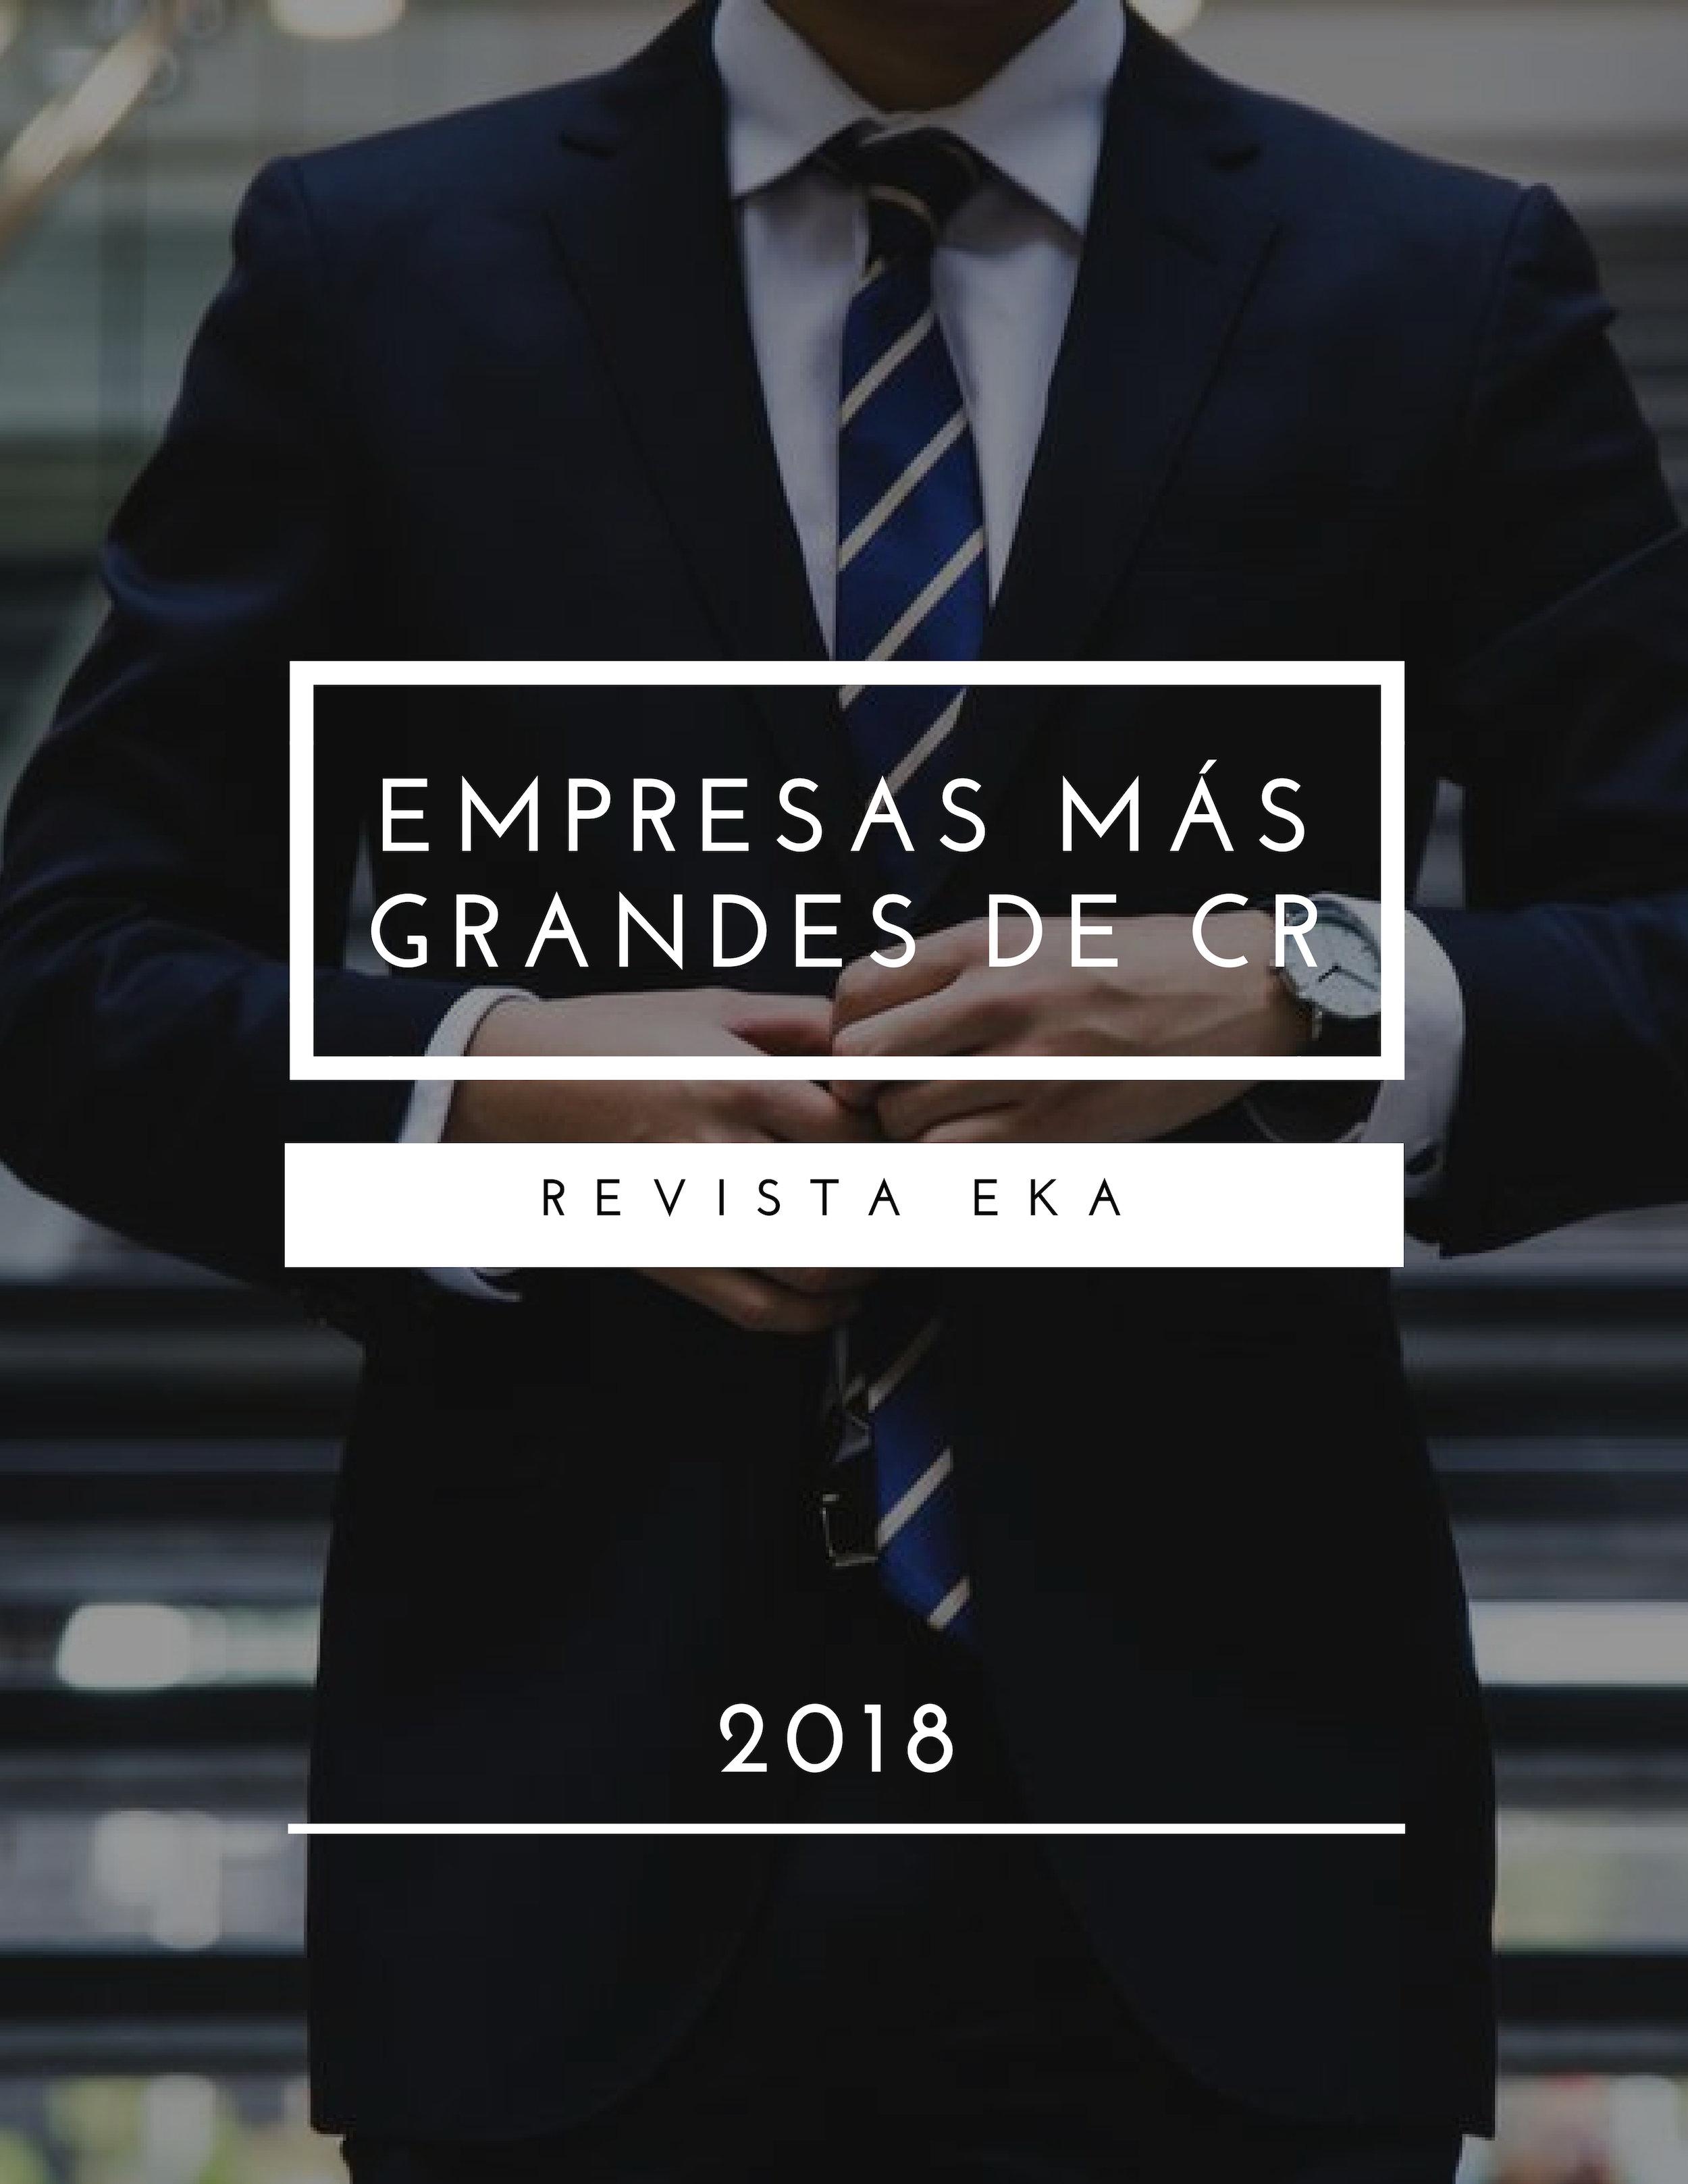 https://www.ekaenlinea.com/wp-content/uploads/2018/12/Empresasmásgrandes.jpg